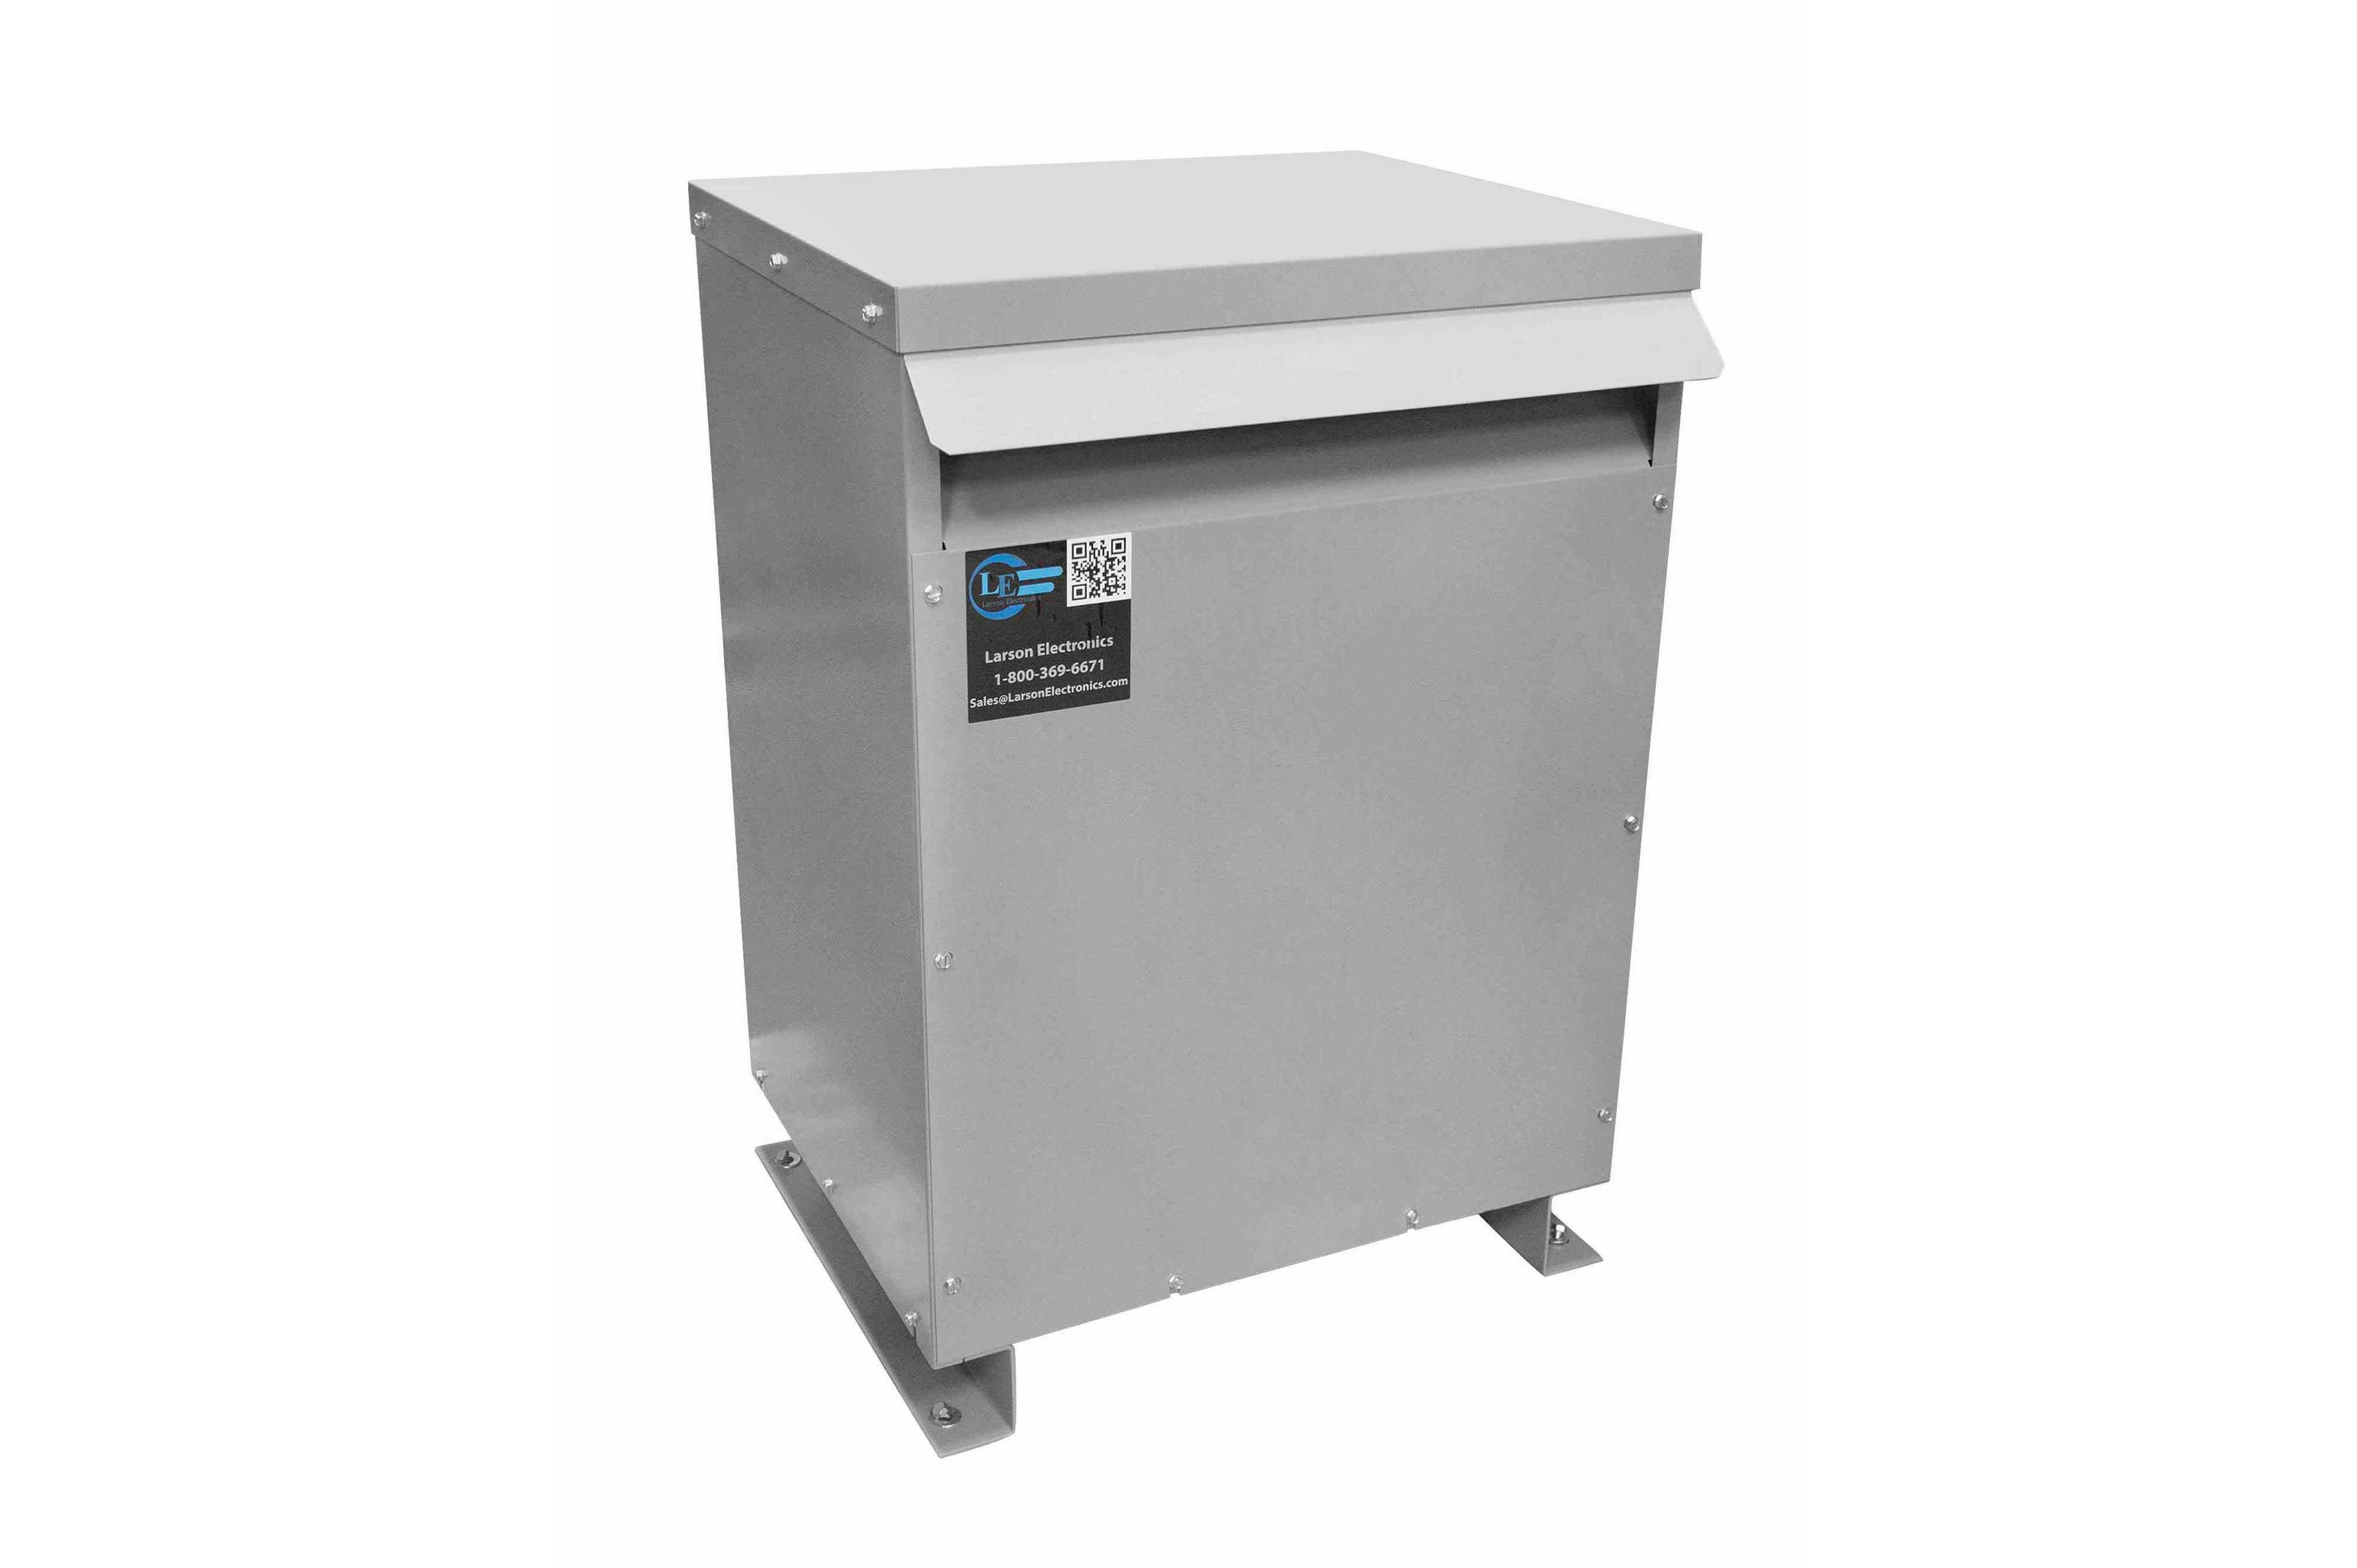 42.5 kVA 3PH Isolation Transformer, 400V Wye Primary, 480Y/277 Wye-N Secondary, N3R, Ventilated, 60 Hz